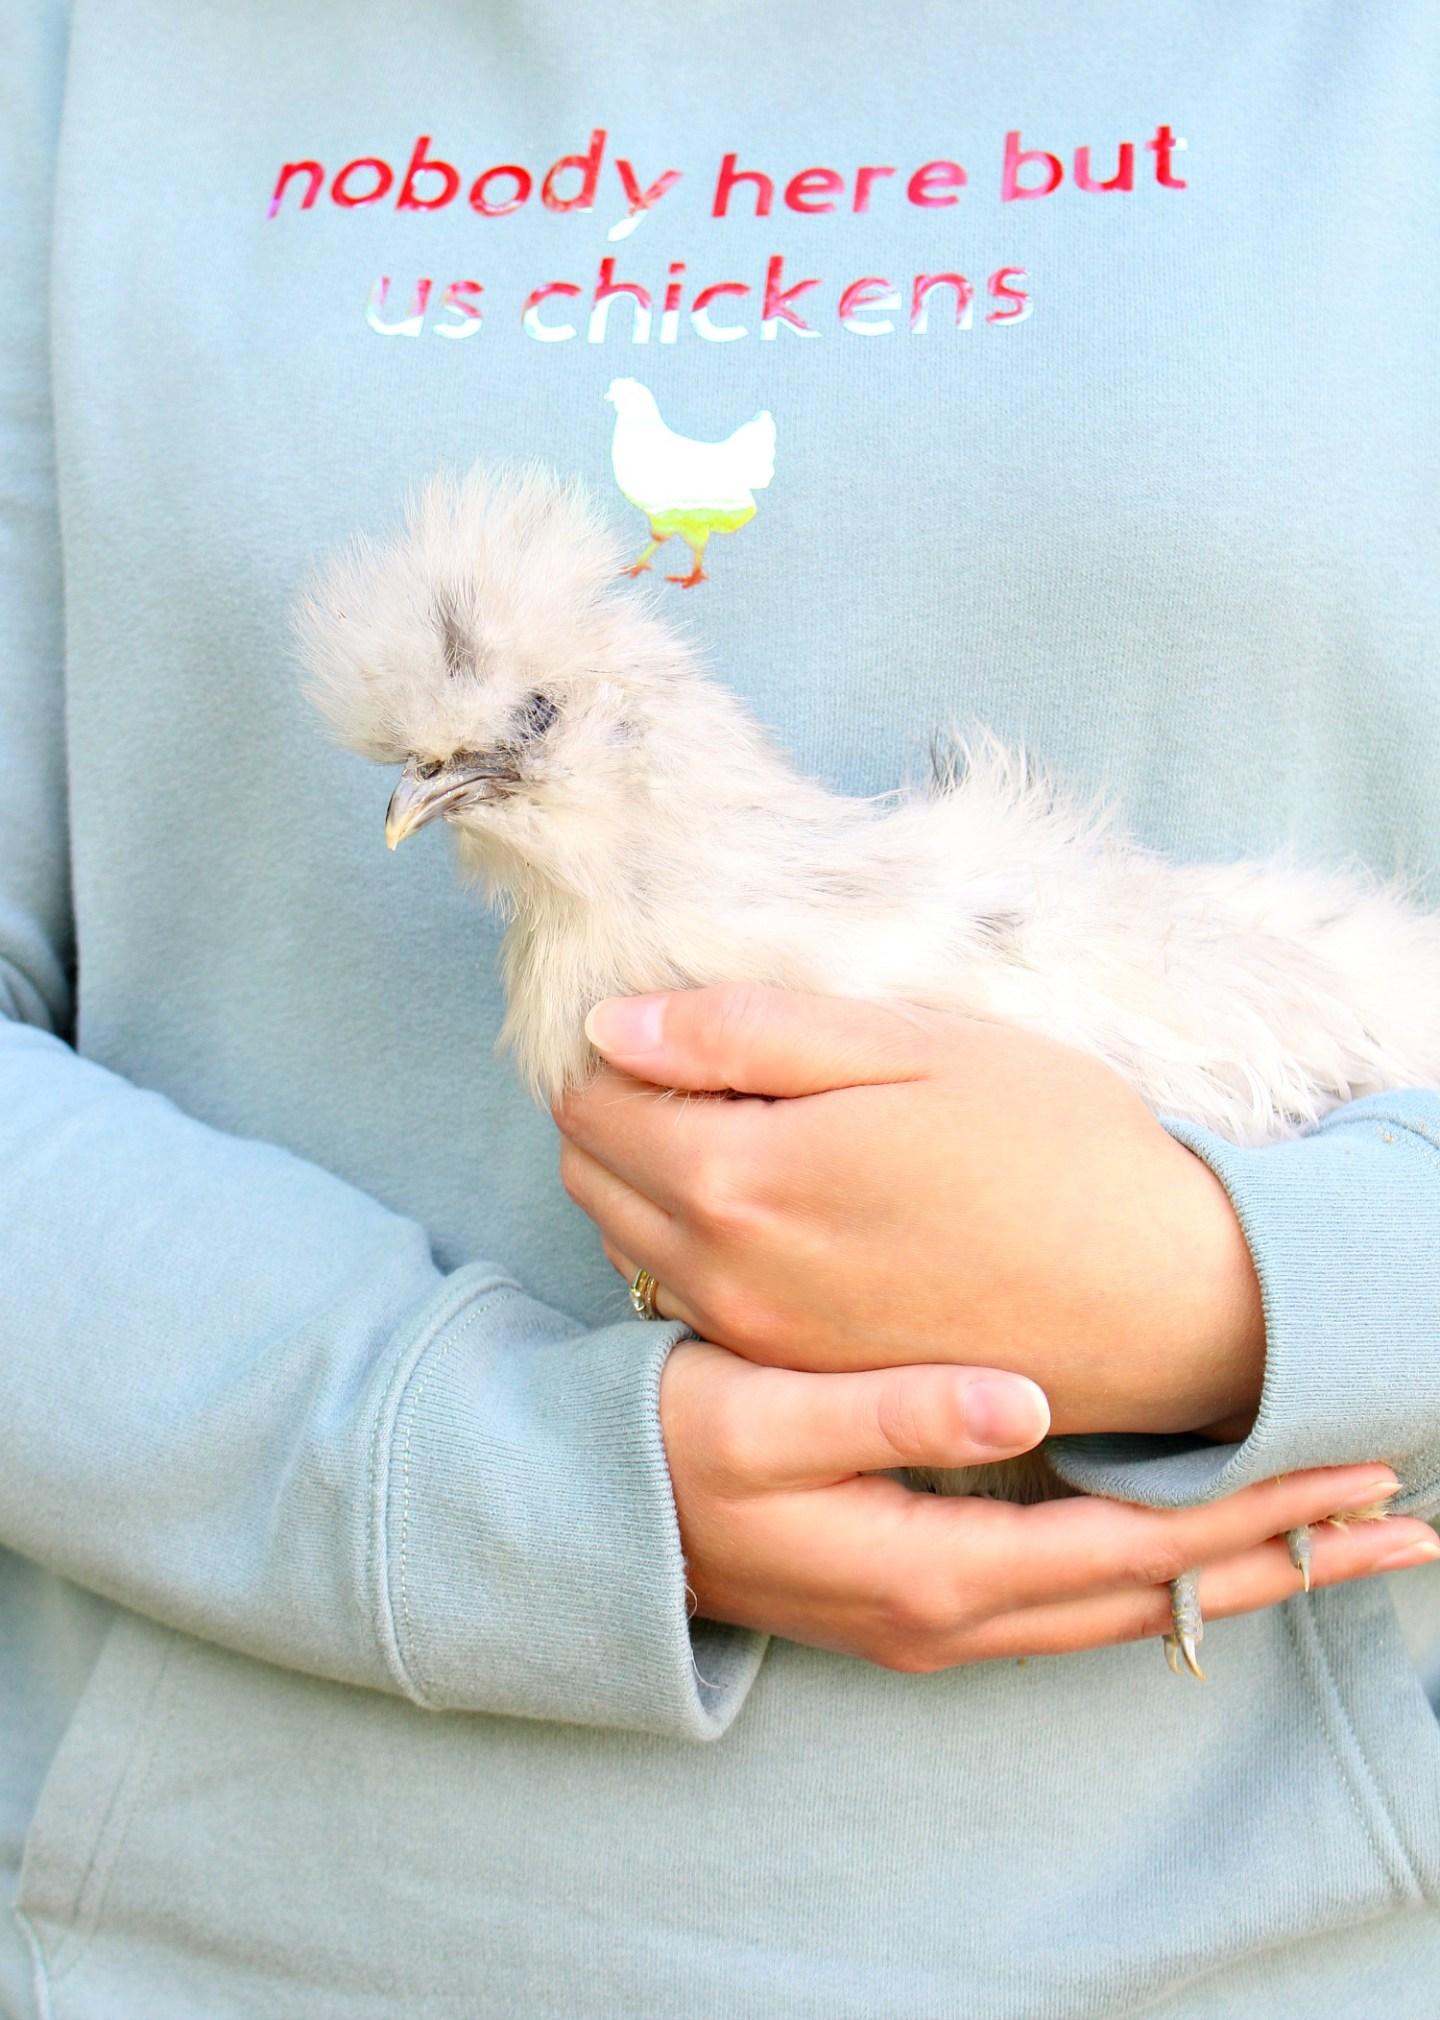 Crazy Chicken Lady DIY Gift Idea